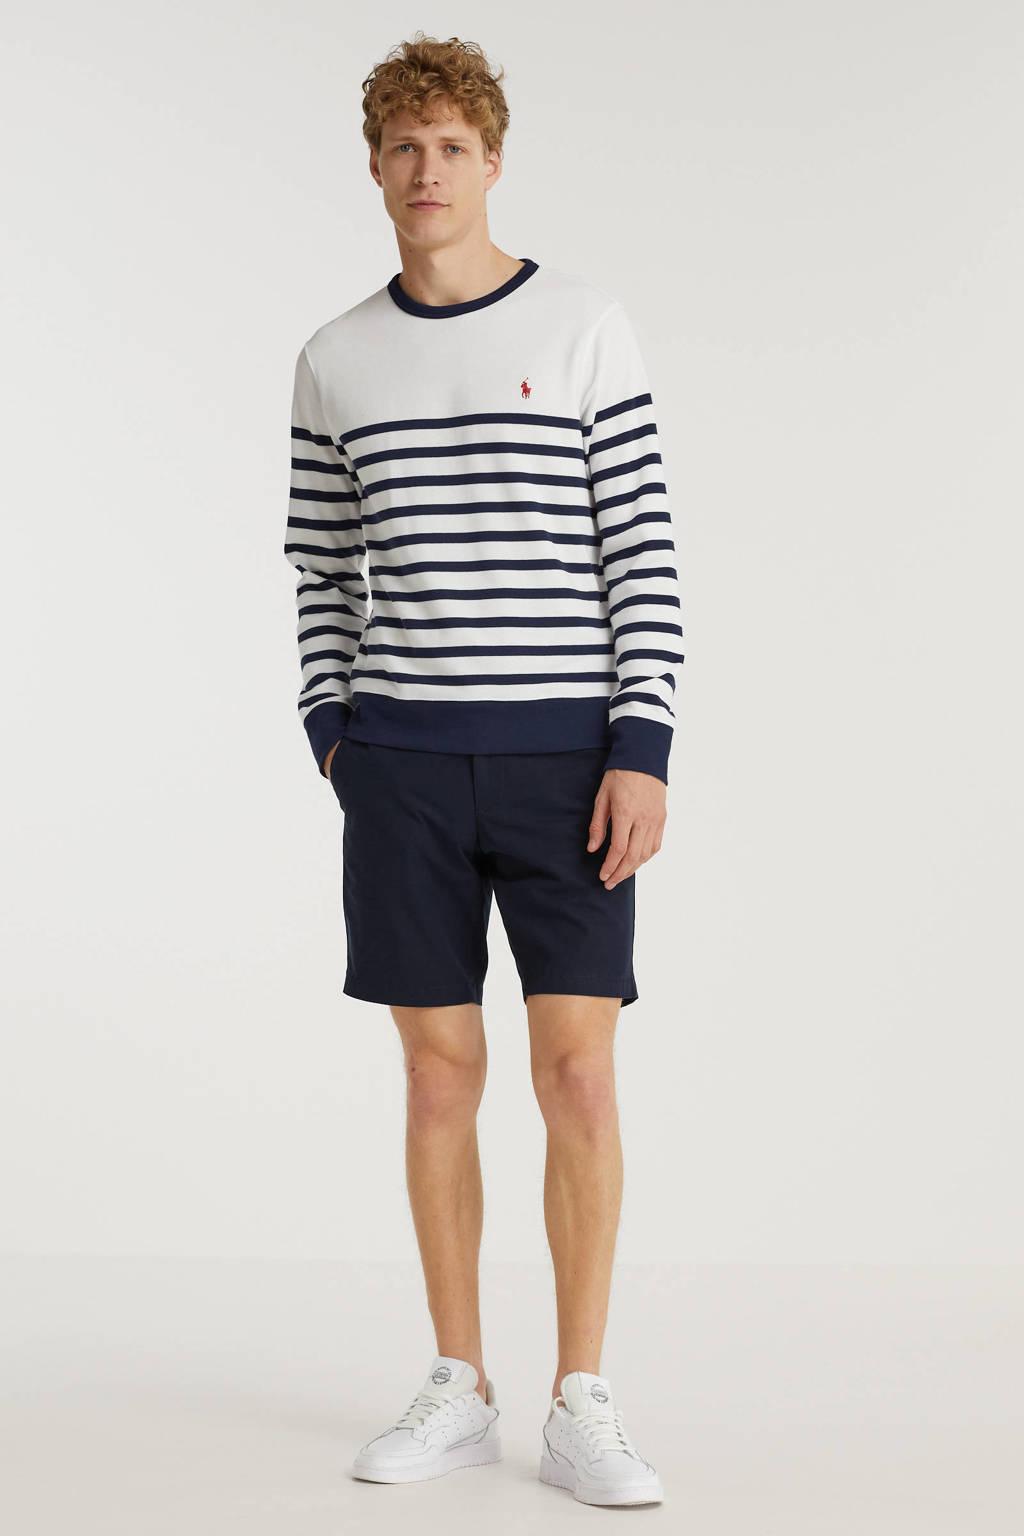 POLO Ralph Lauren gestreepte sweater wit/donkerblauw, Wit/donkerblauw